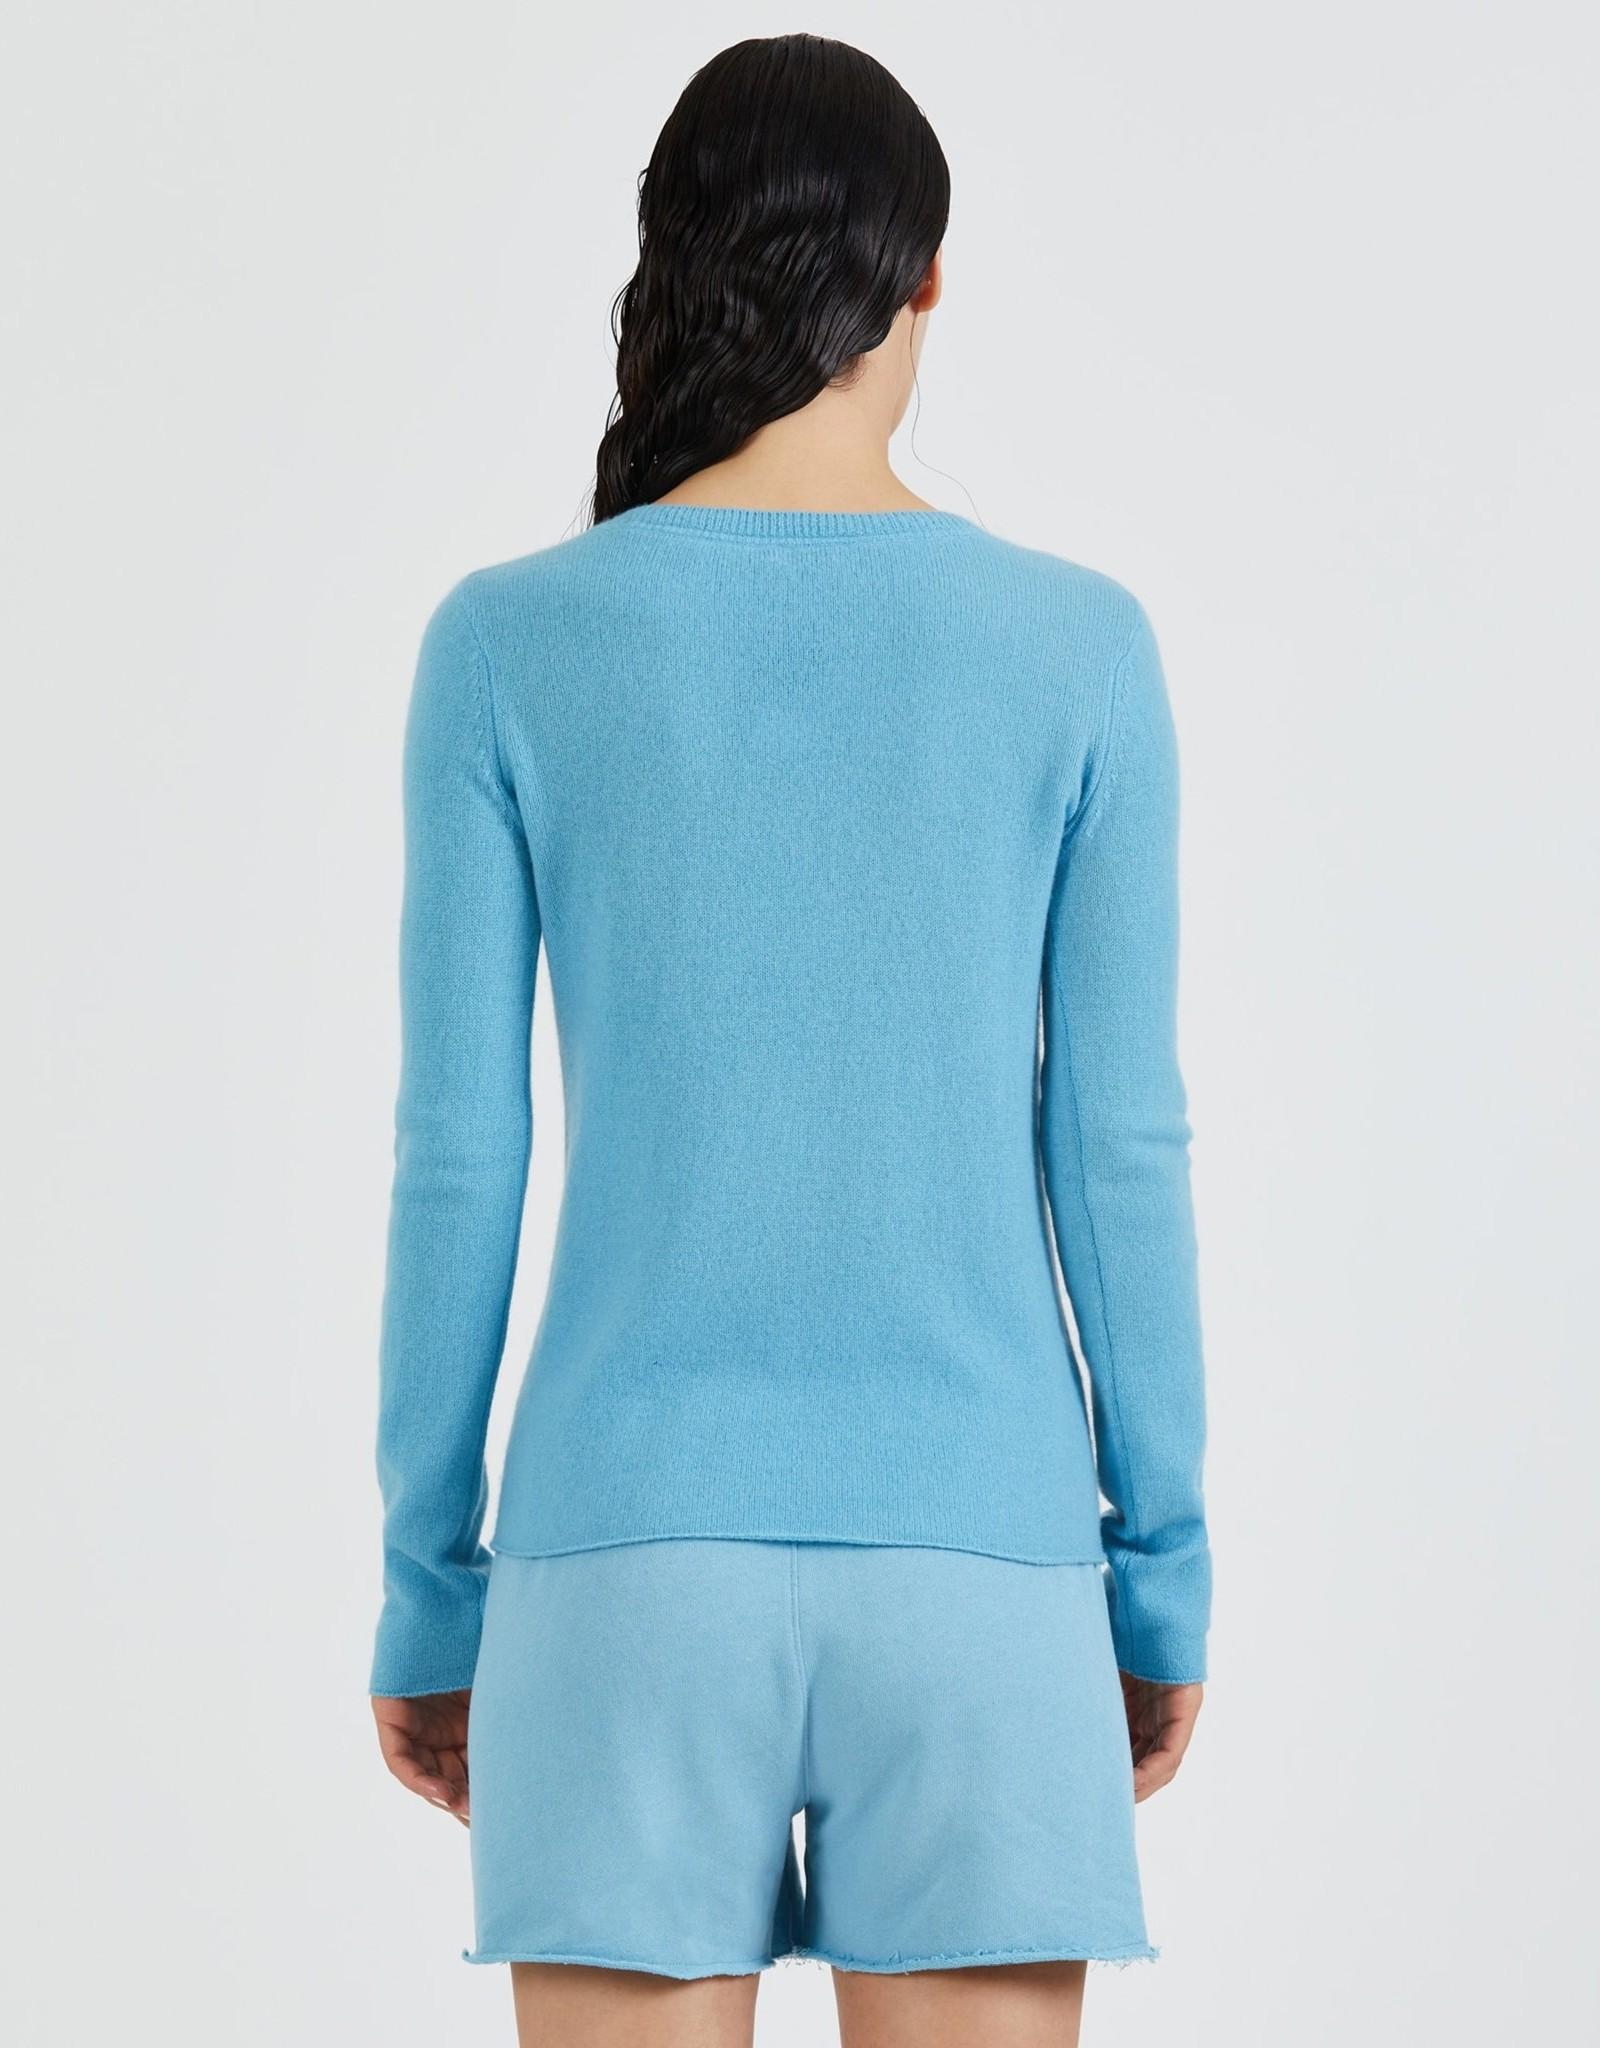 ATM Cashmere V Neck Sweater